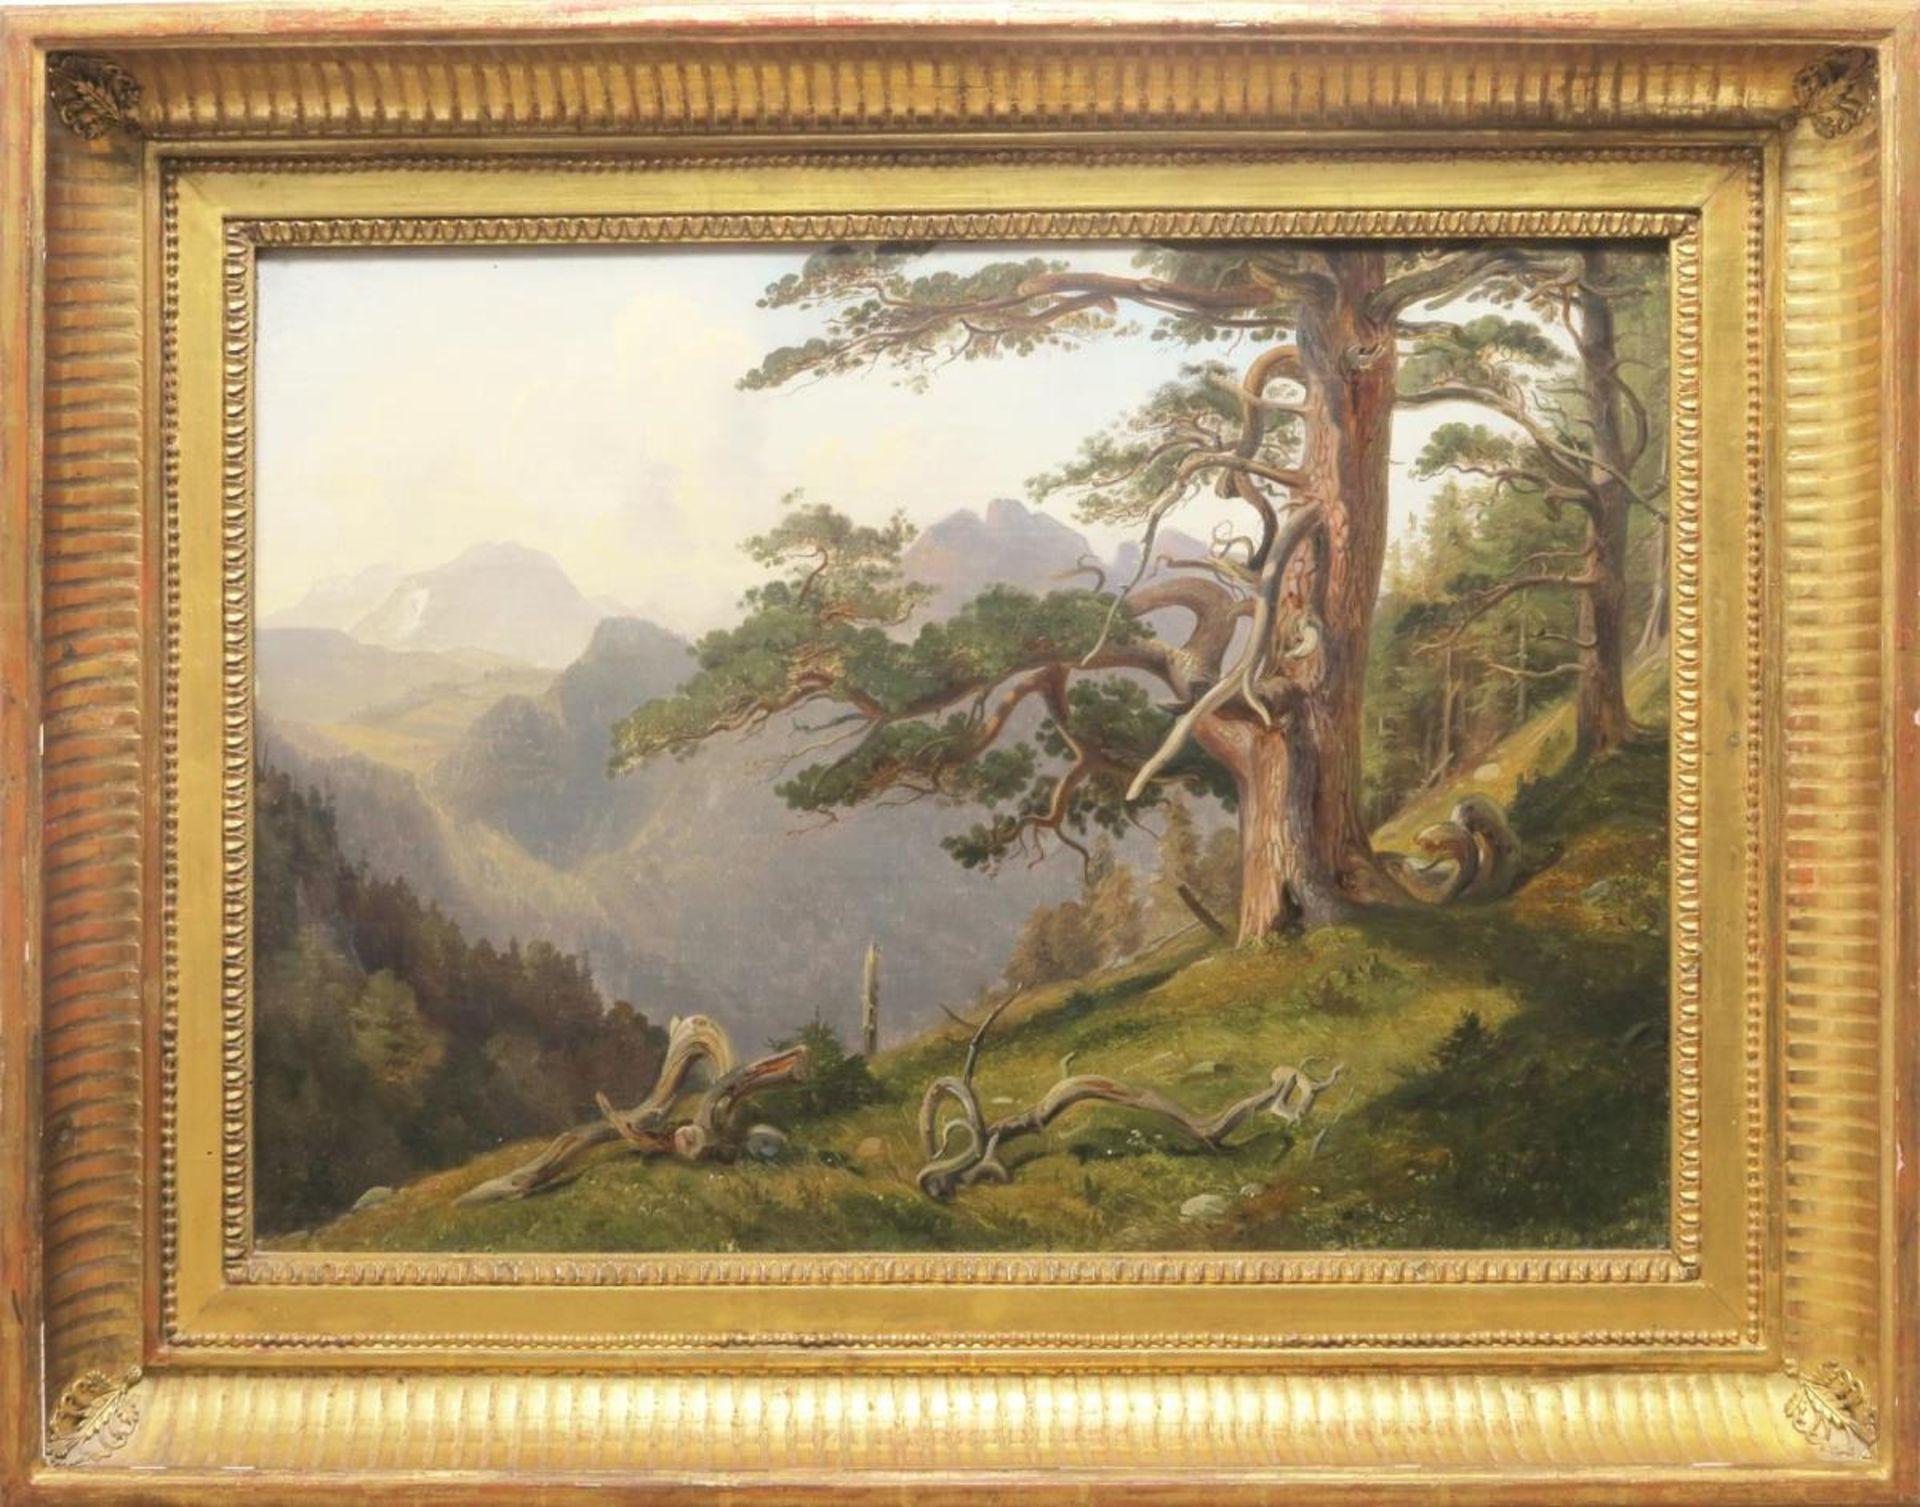 Kiefer im Gebirge